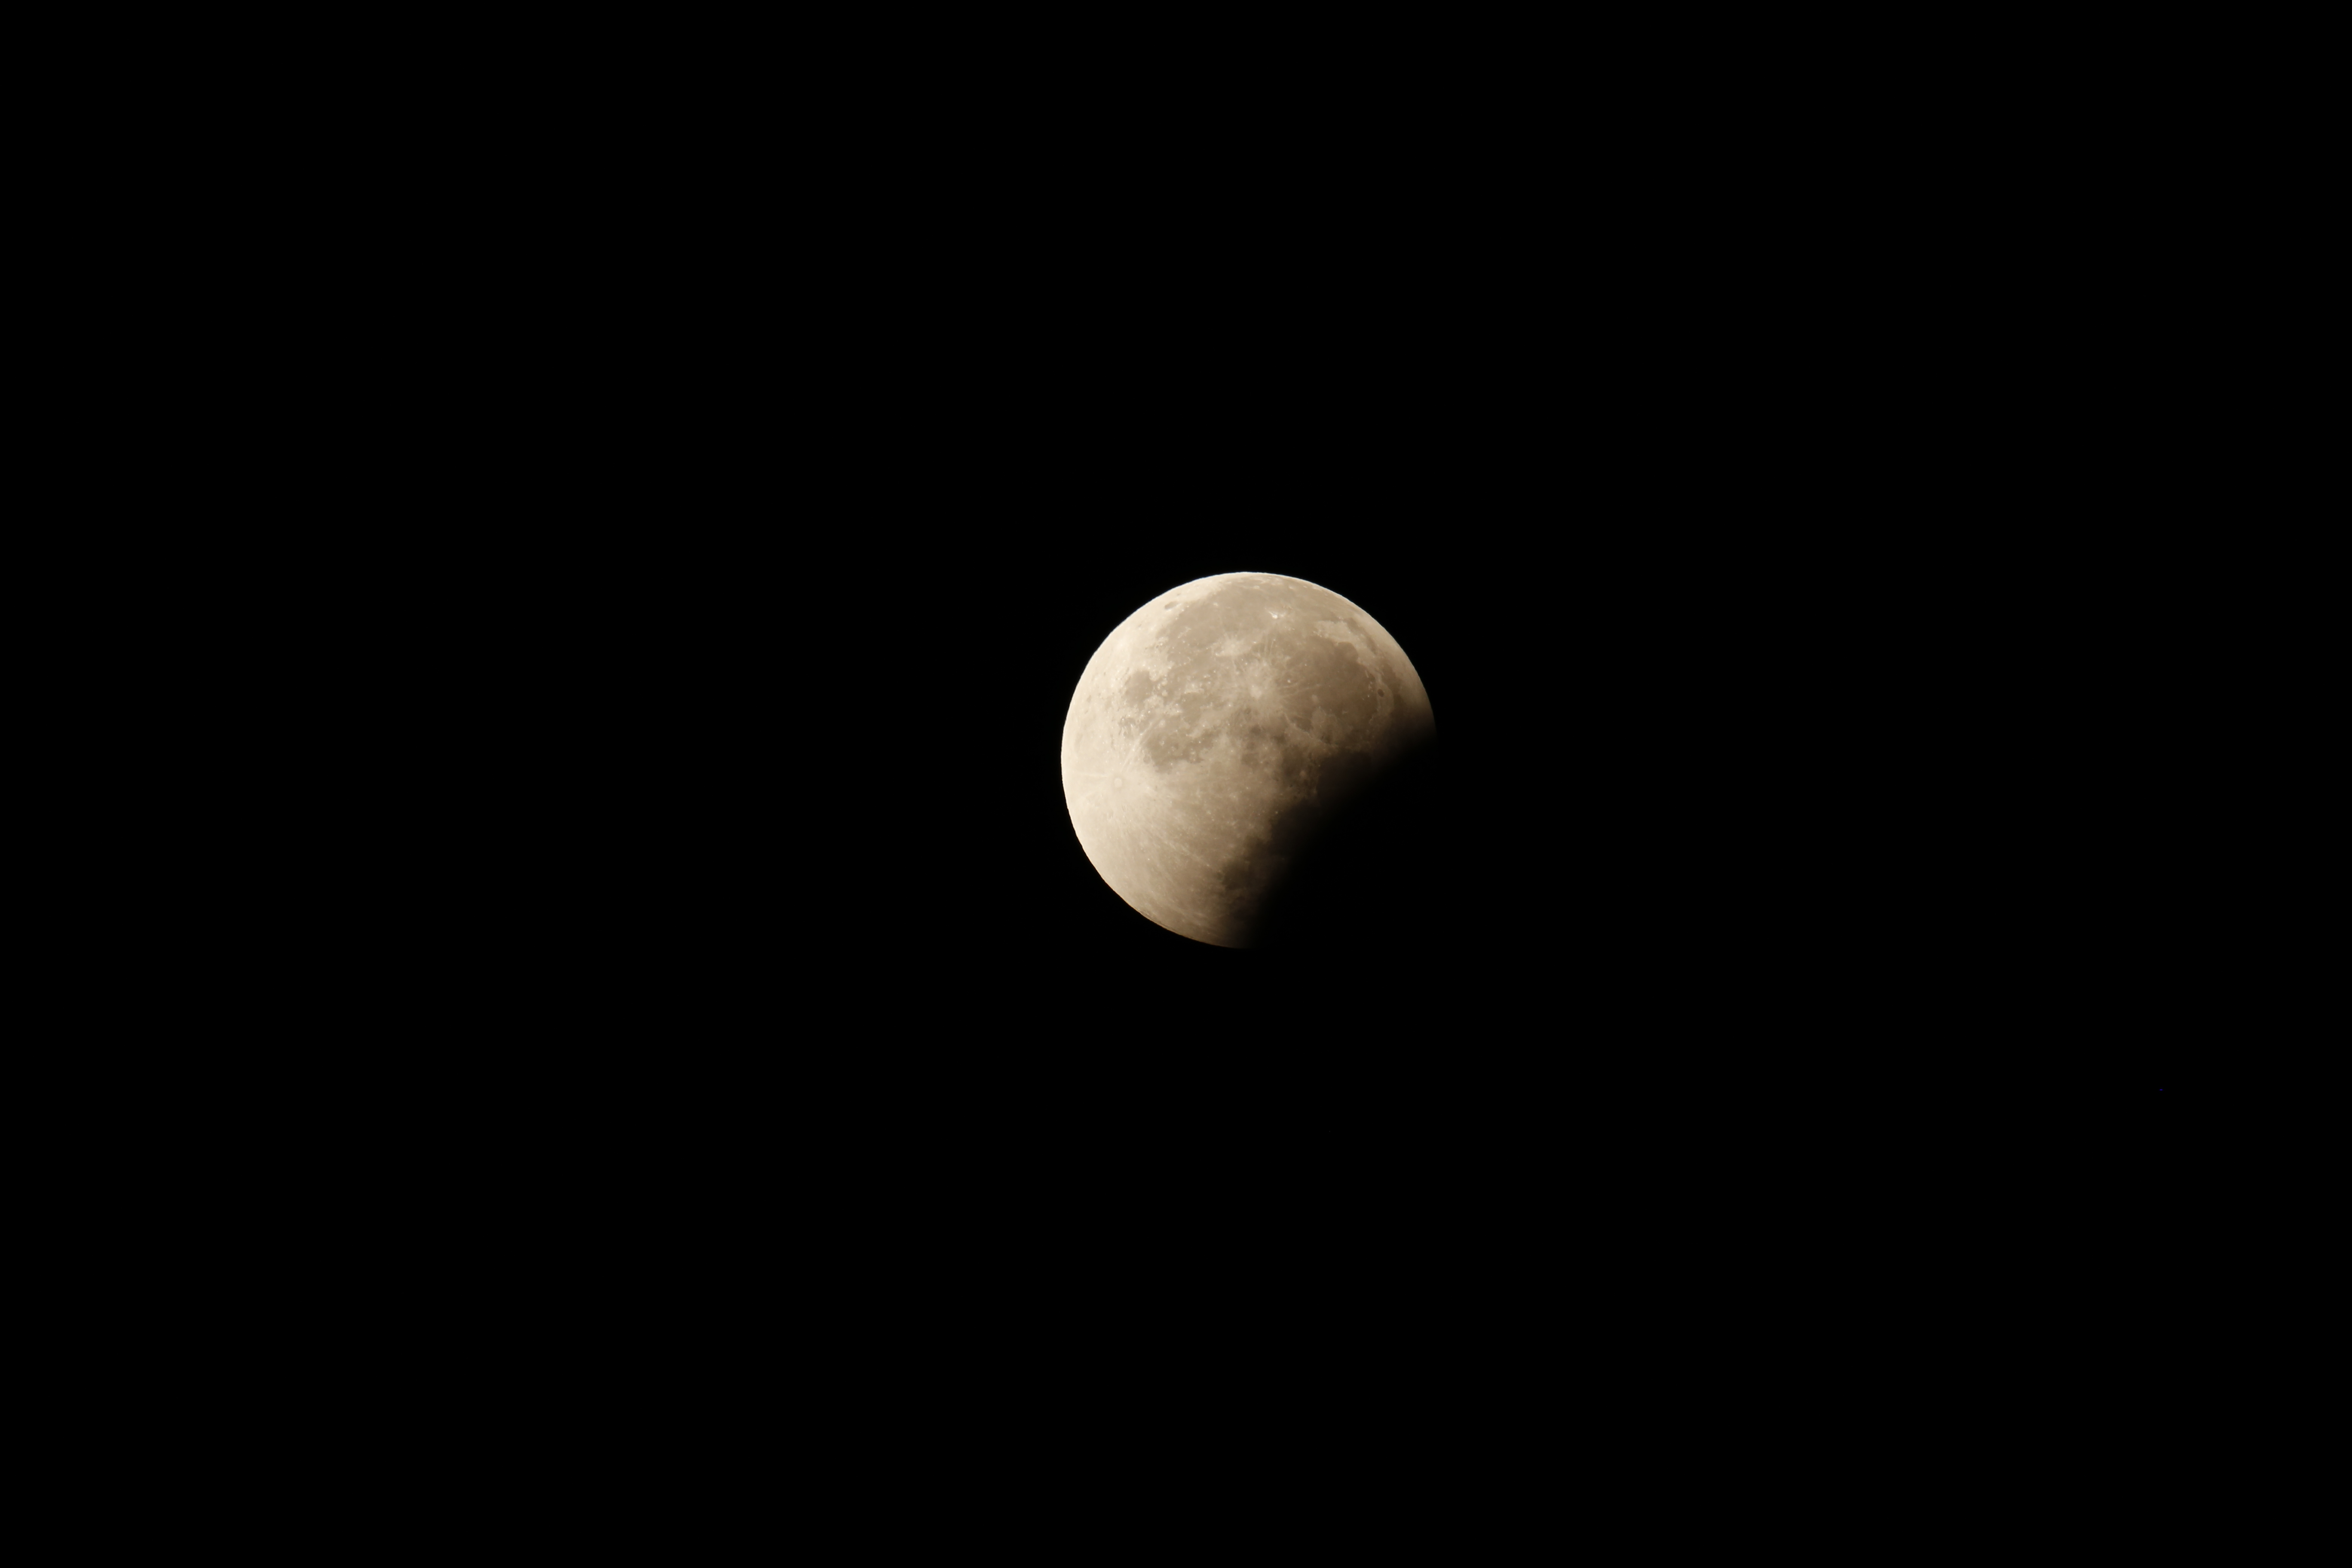 Eclipse 27 sept 2015